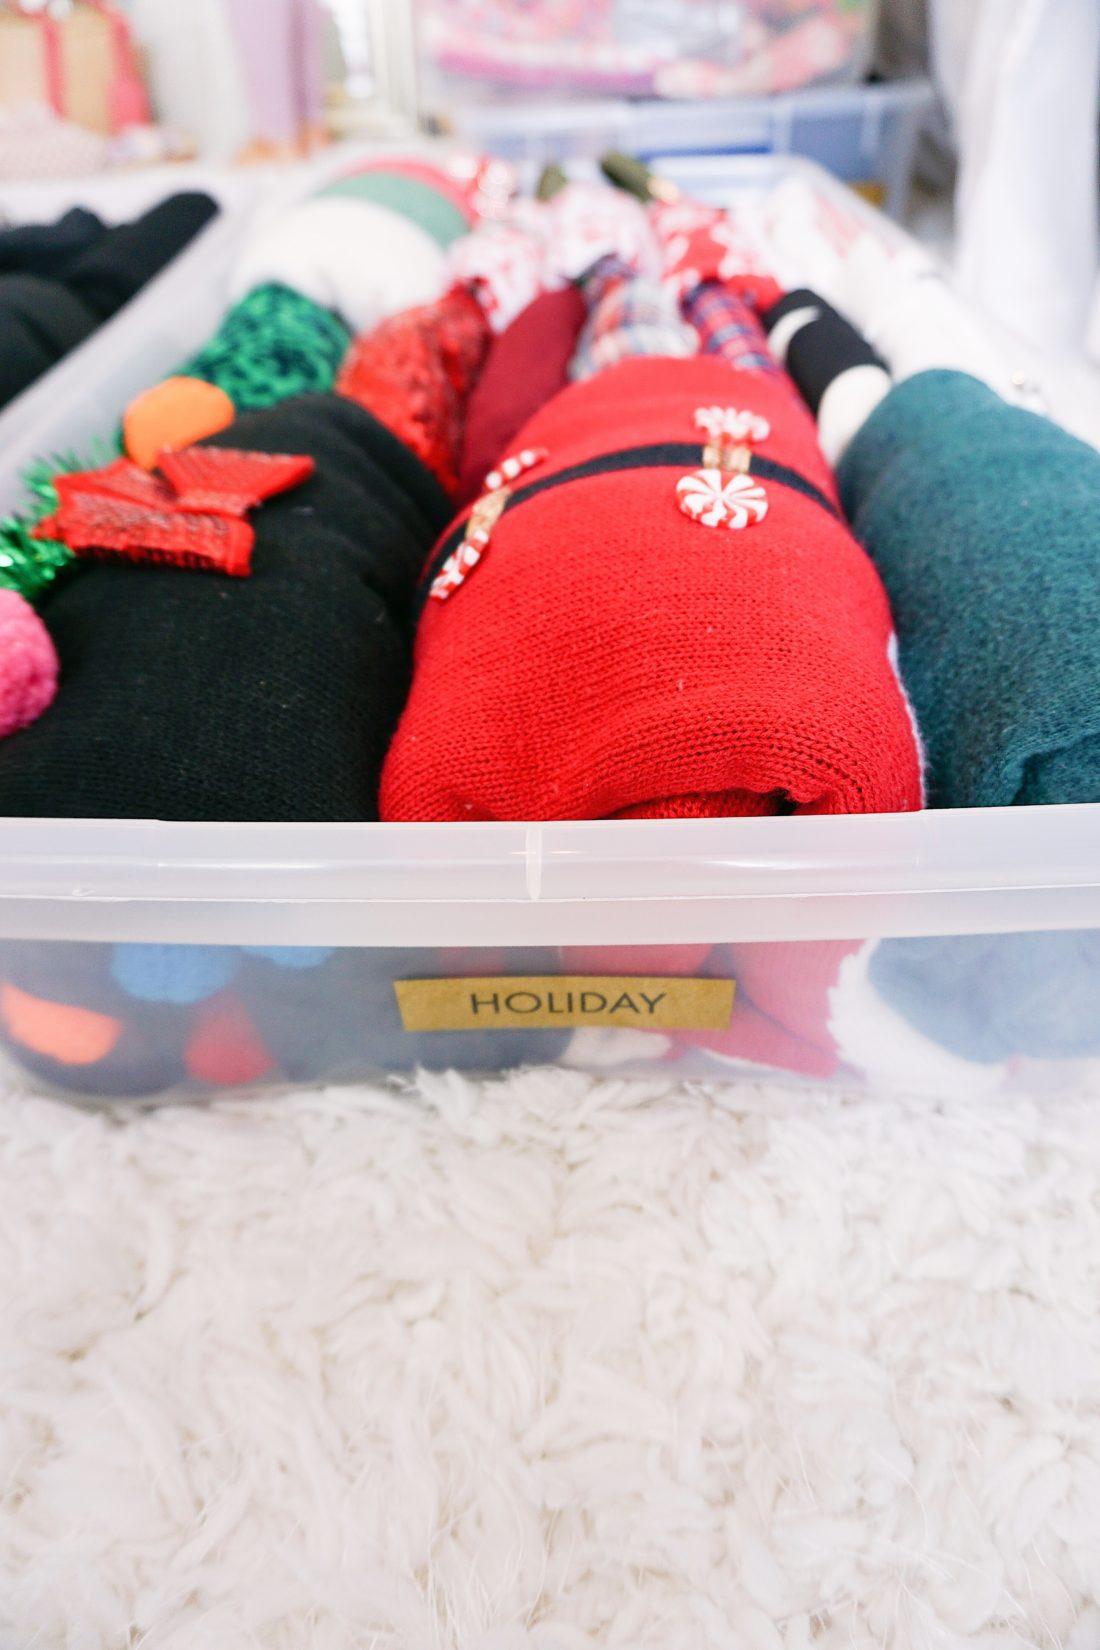 House of Turk closet organization under bed holiday storage